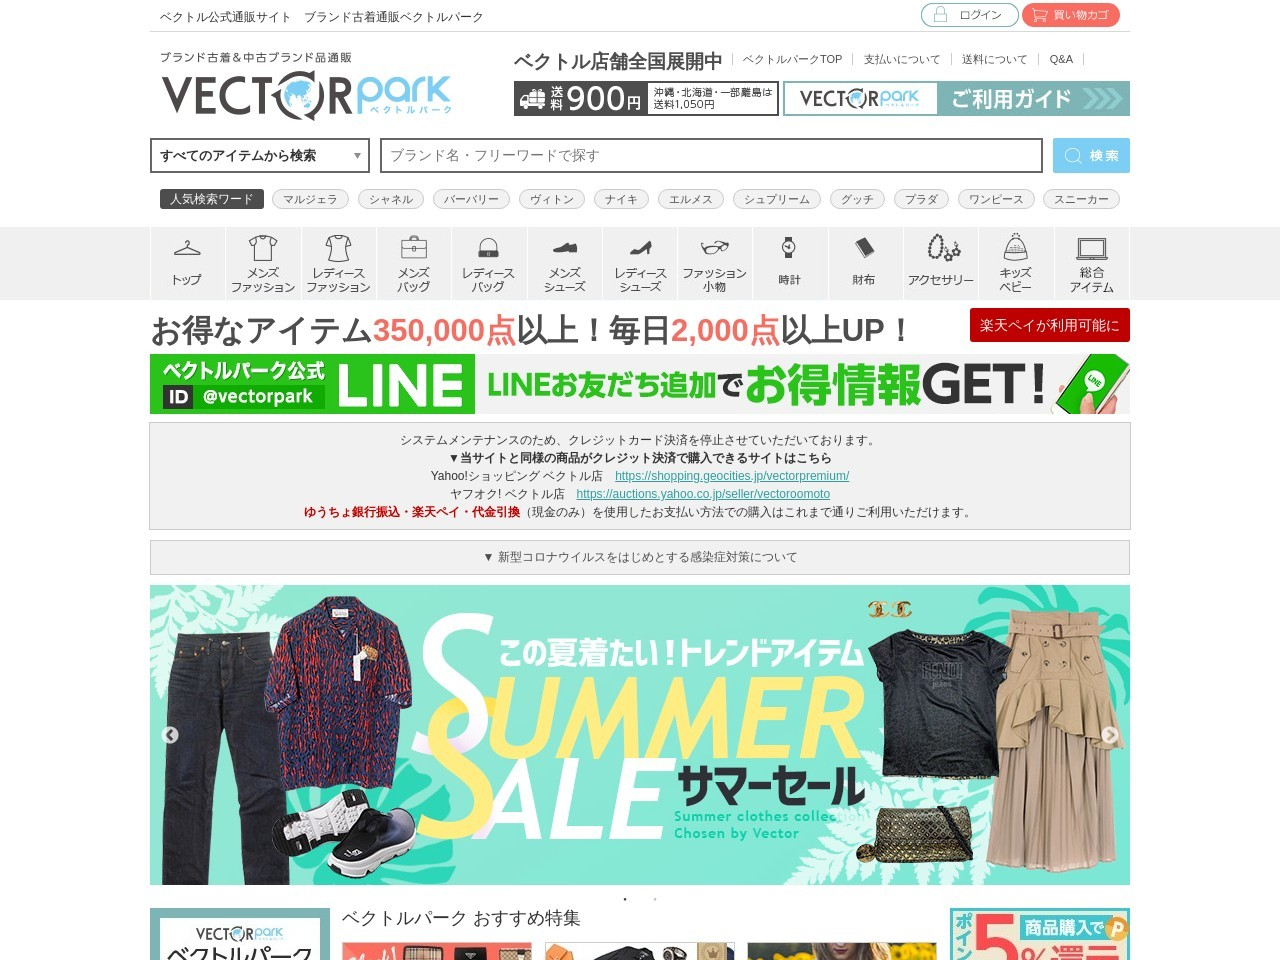 http://vector-park.jp/item_list/?bc=05569